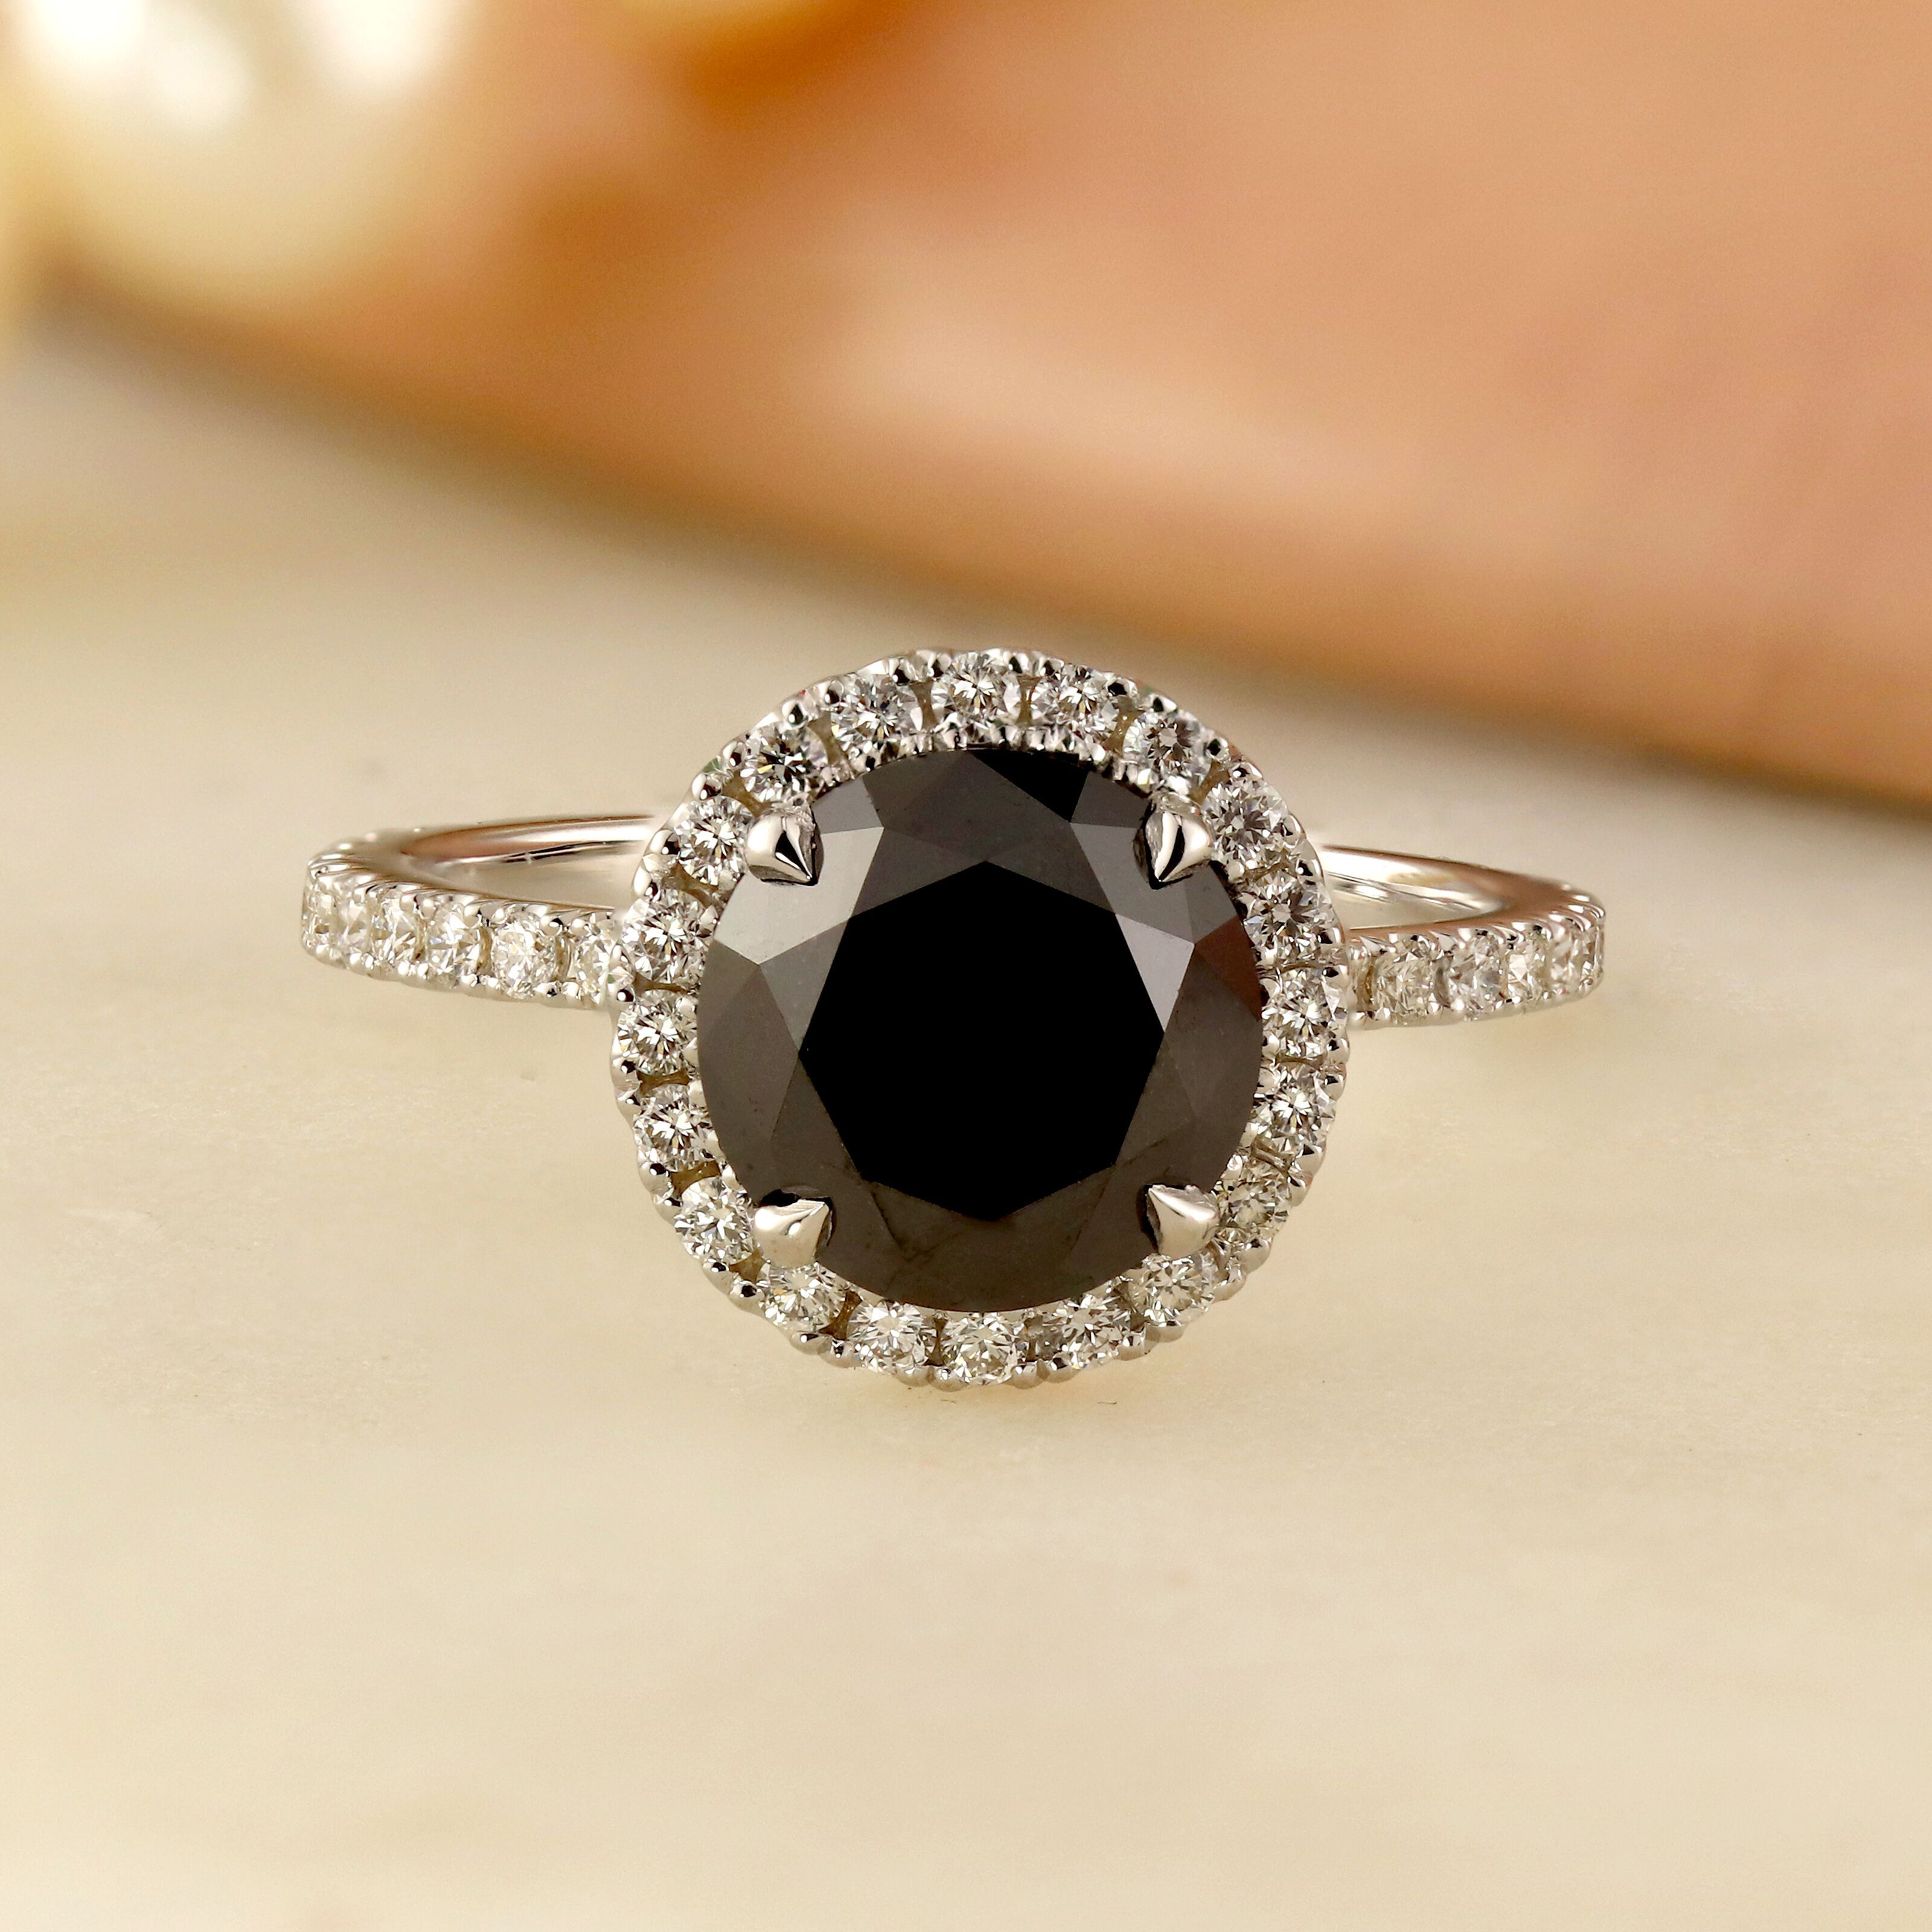 Skylar Halo Black Diamond Engagement Ring In 14k White Gold With 1 00 Carat Round Diamond Black Diamond Ring Engagement Black Diamond Halo Ring Engagement Rings Sapphire